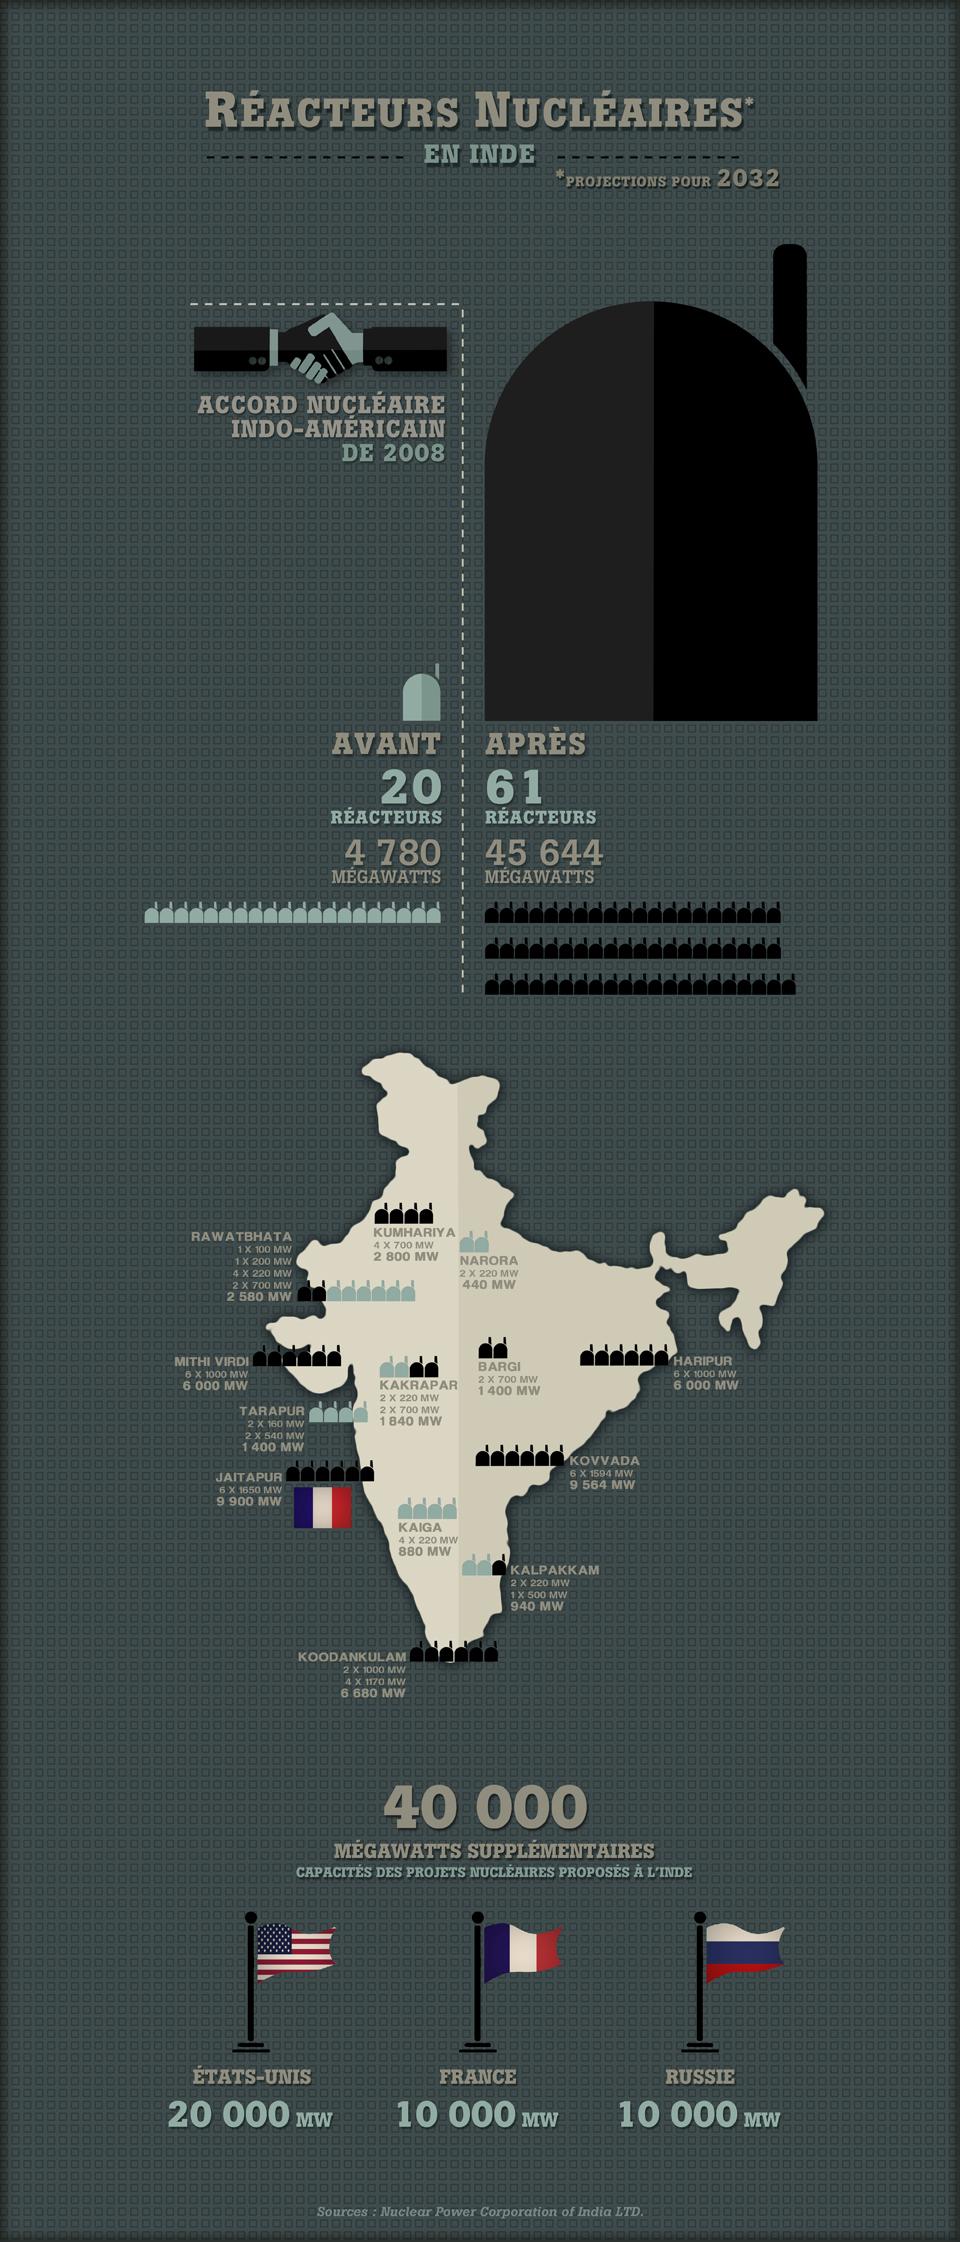 Réacteurs en Inde